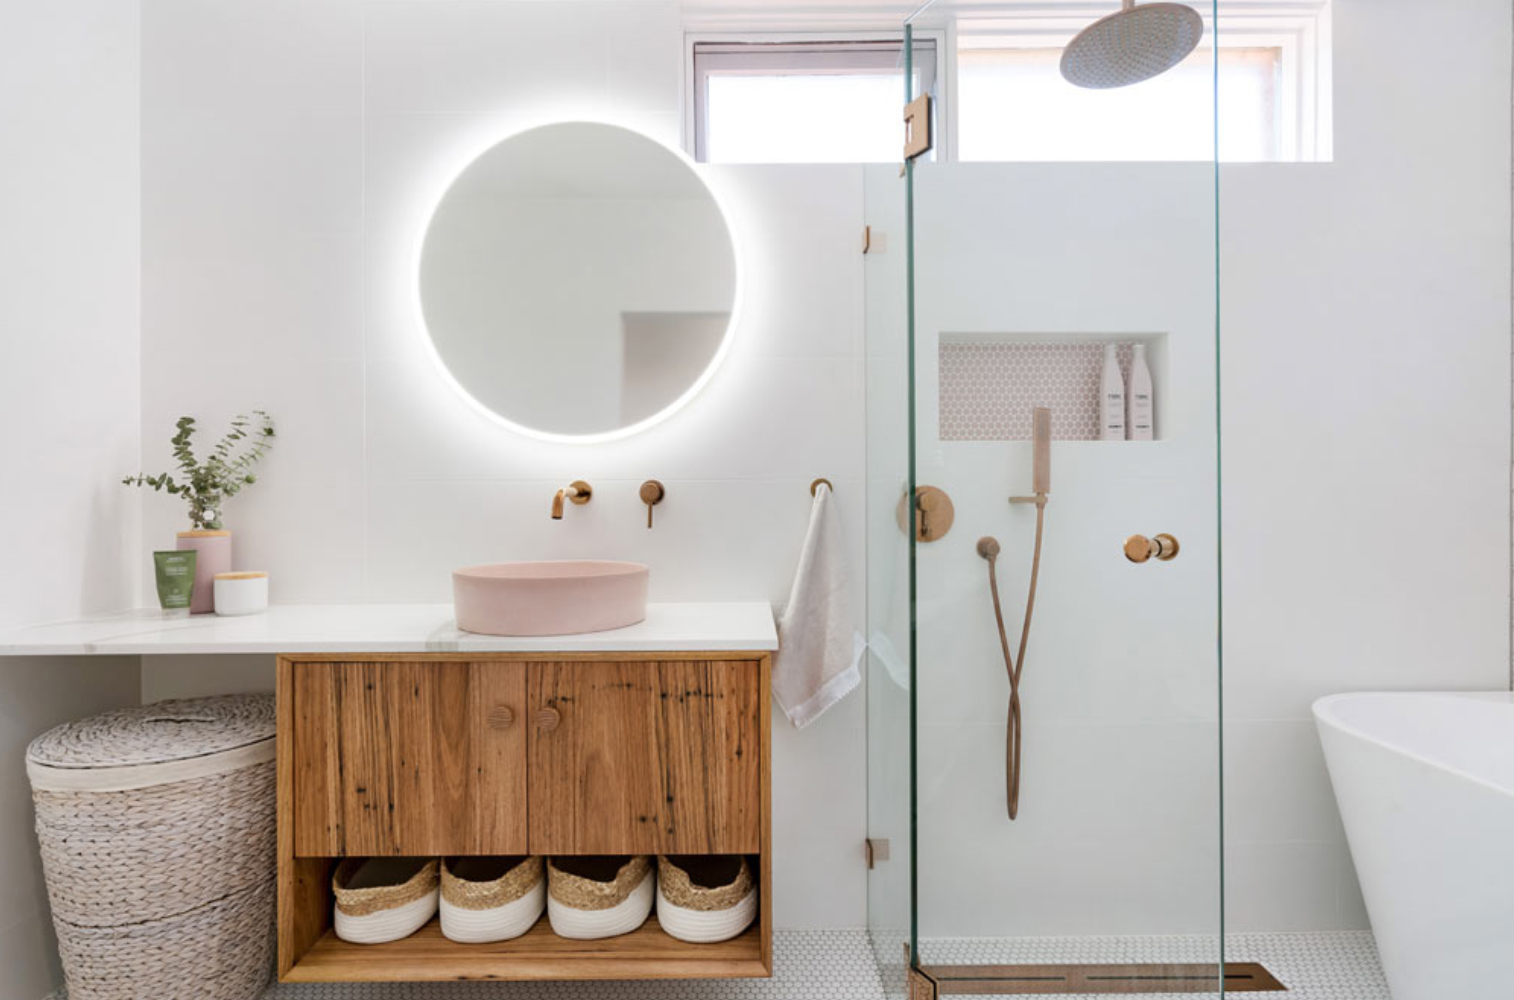 Lights in bathroom